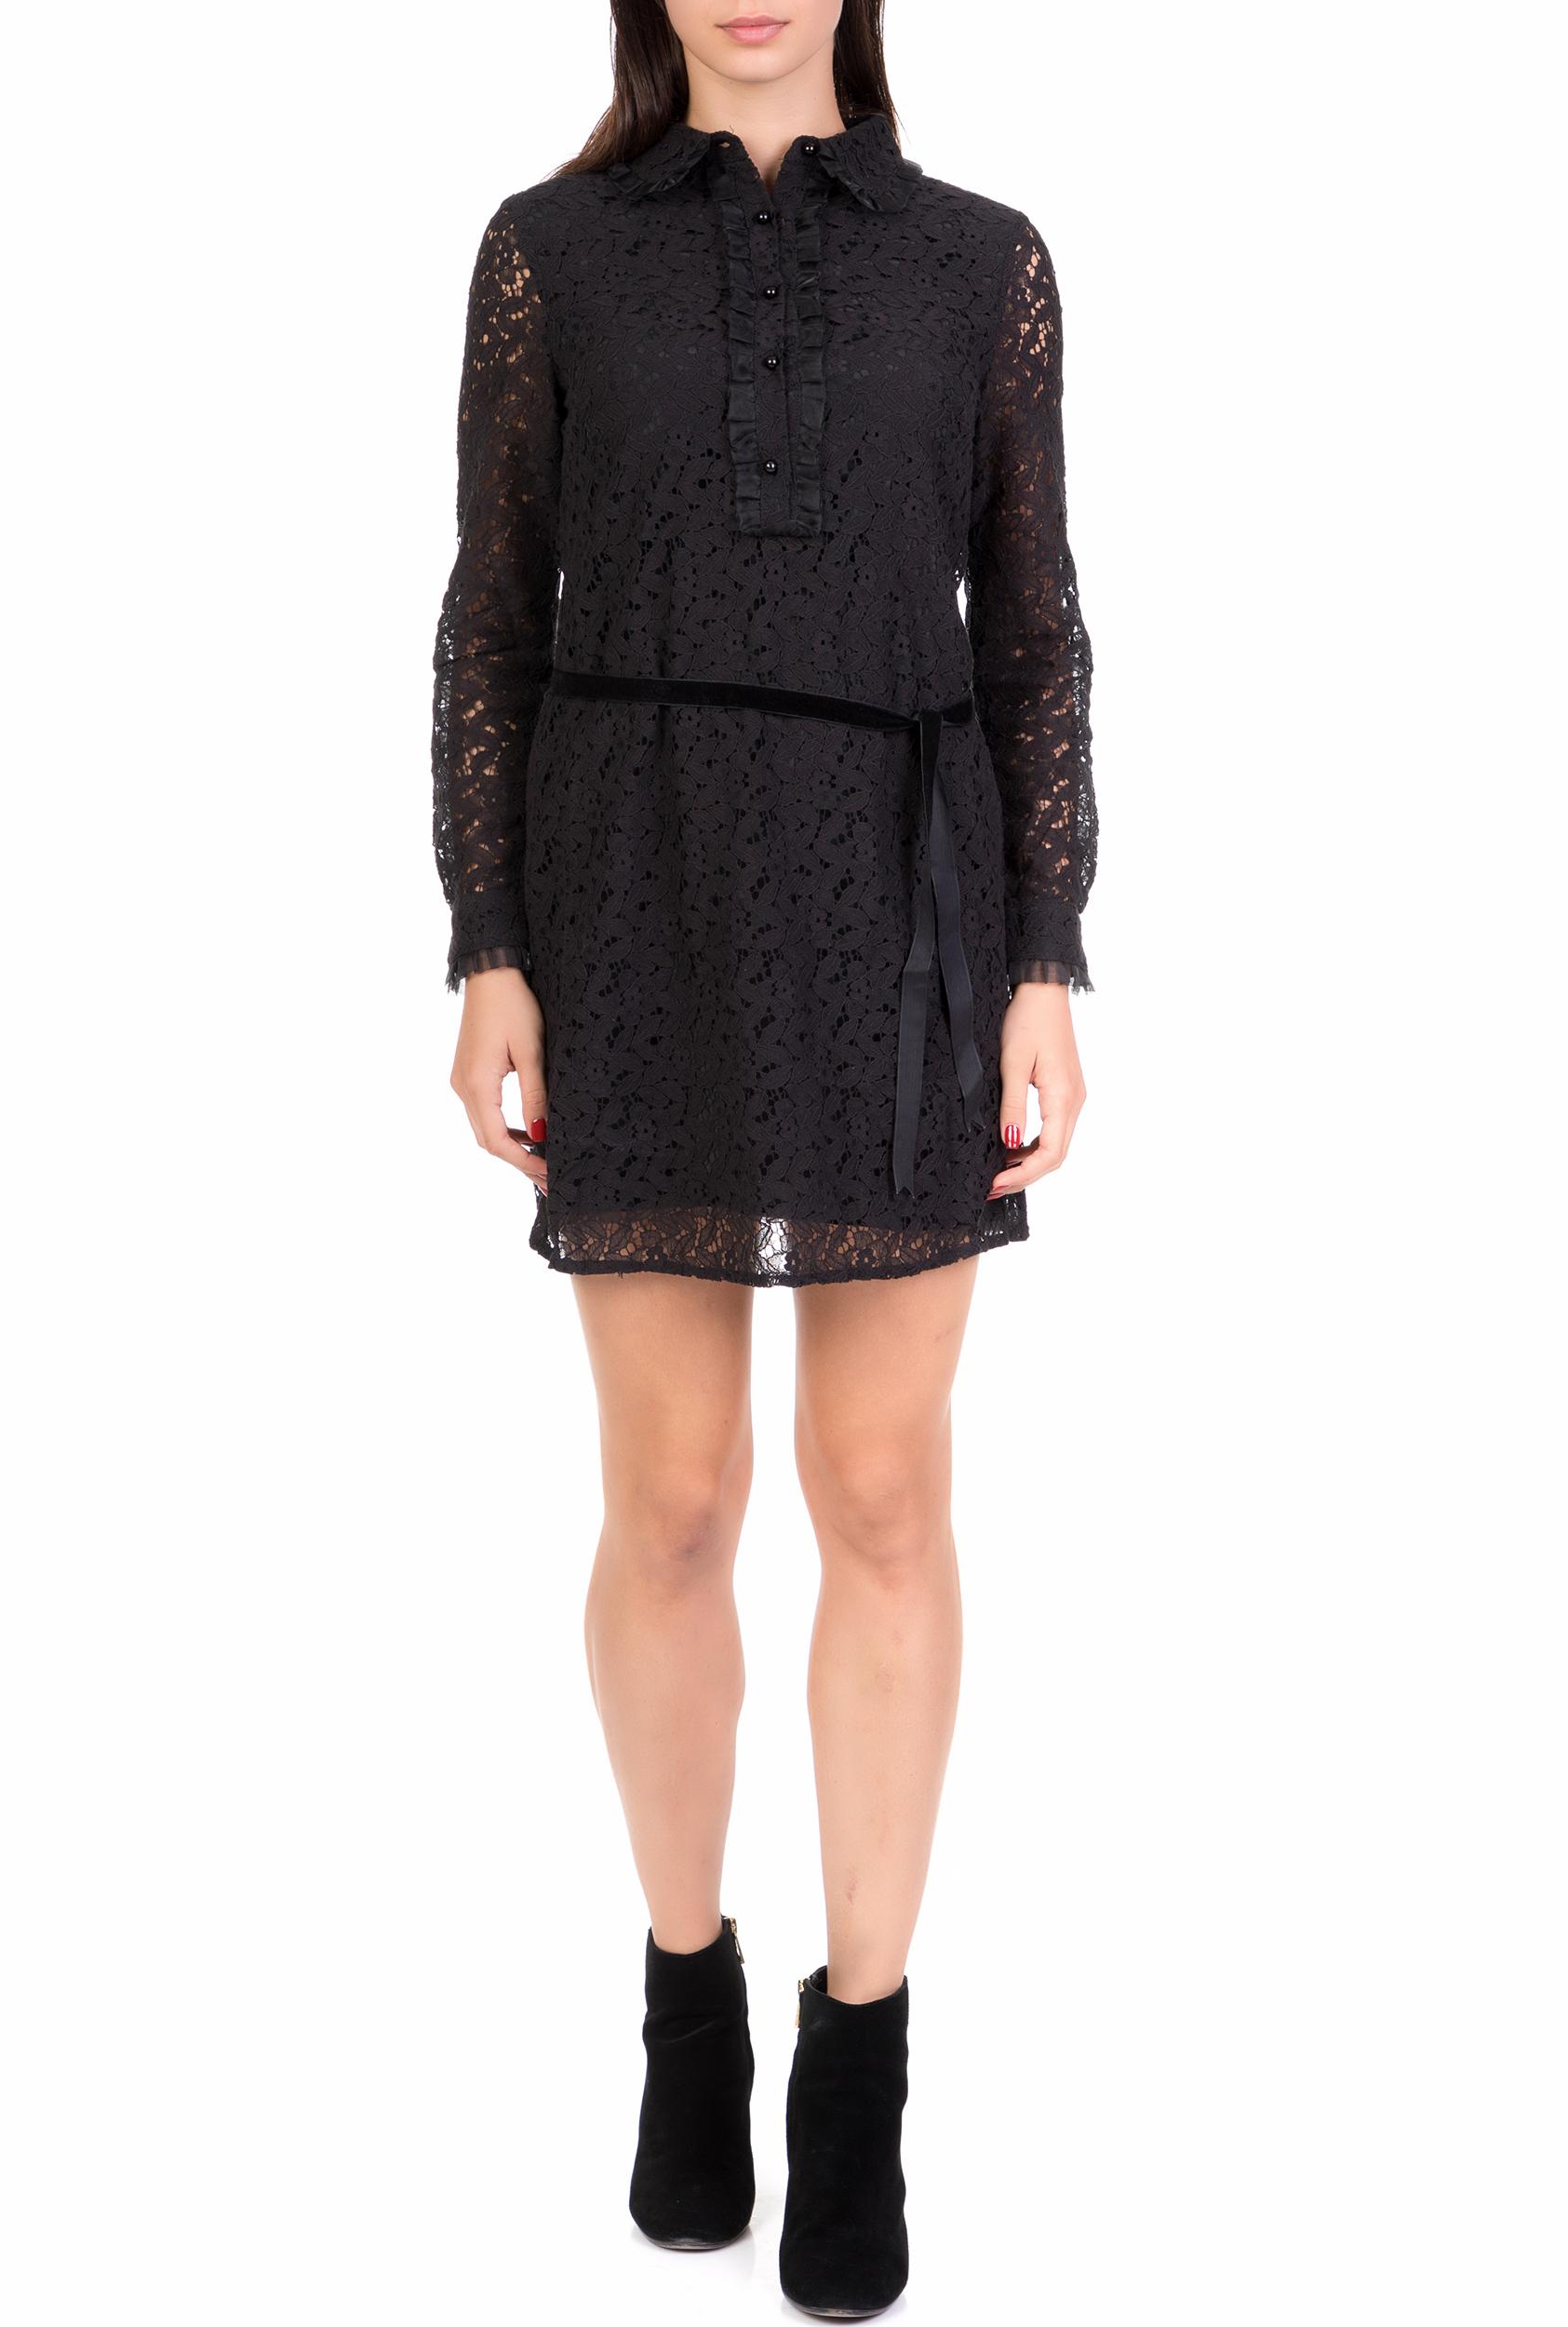 MOLLY BRACKEN - Γυναικείο μίνι φόρεμα από δαντέλα MOLLY BRACKEN μαύρο γυναικεία ρούχα φόρεματα μίνι